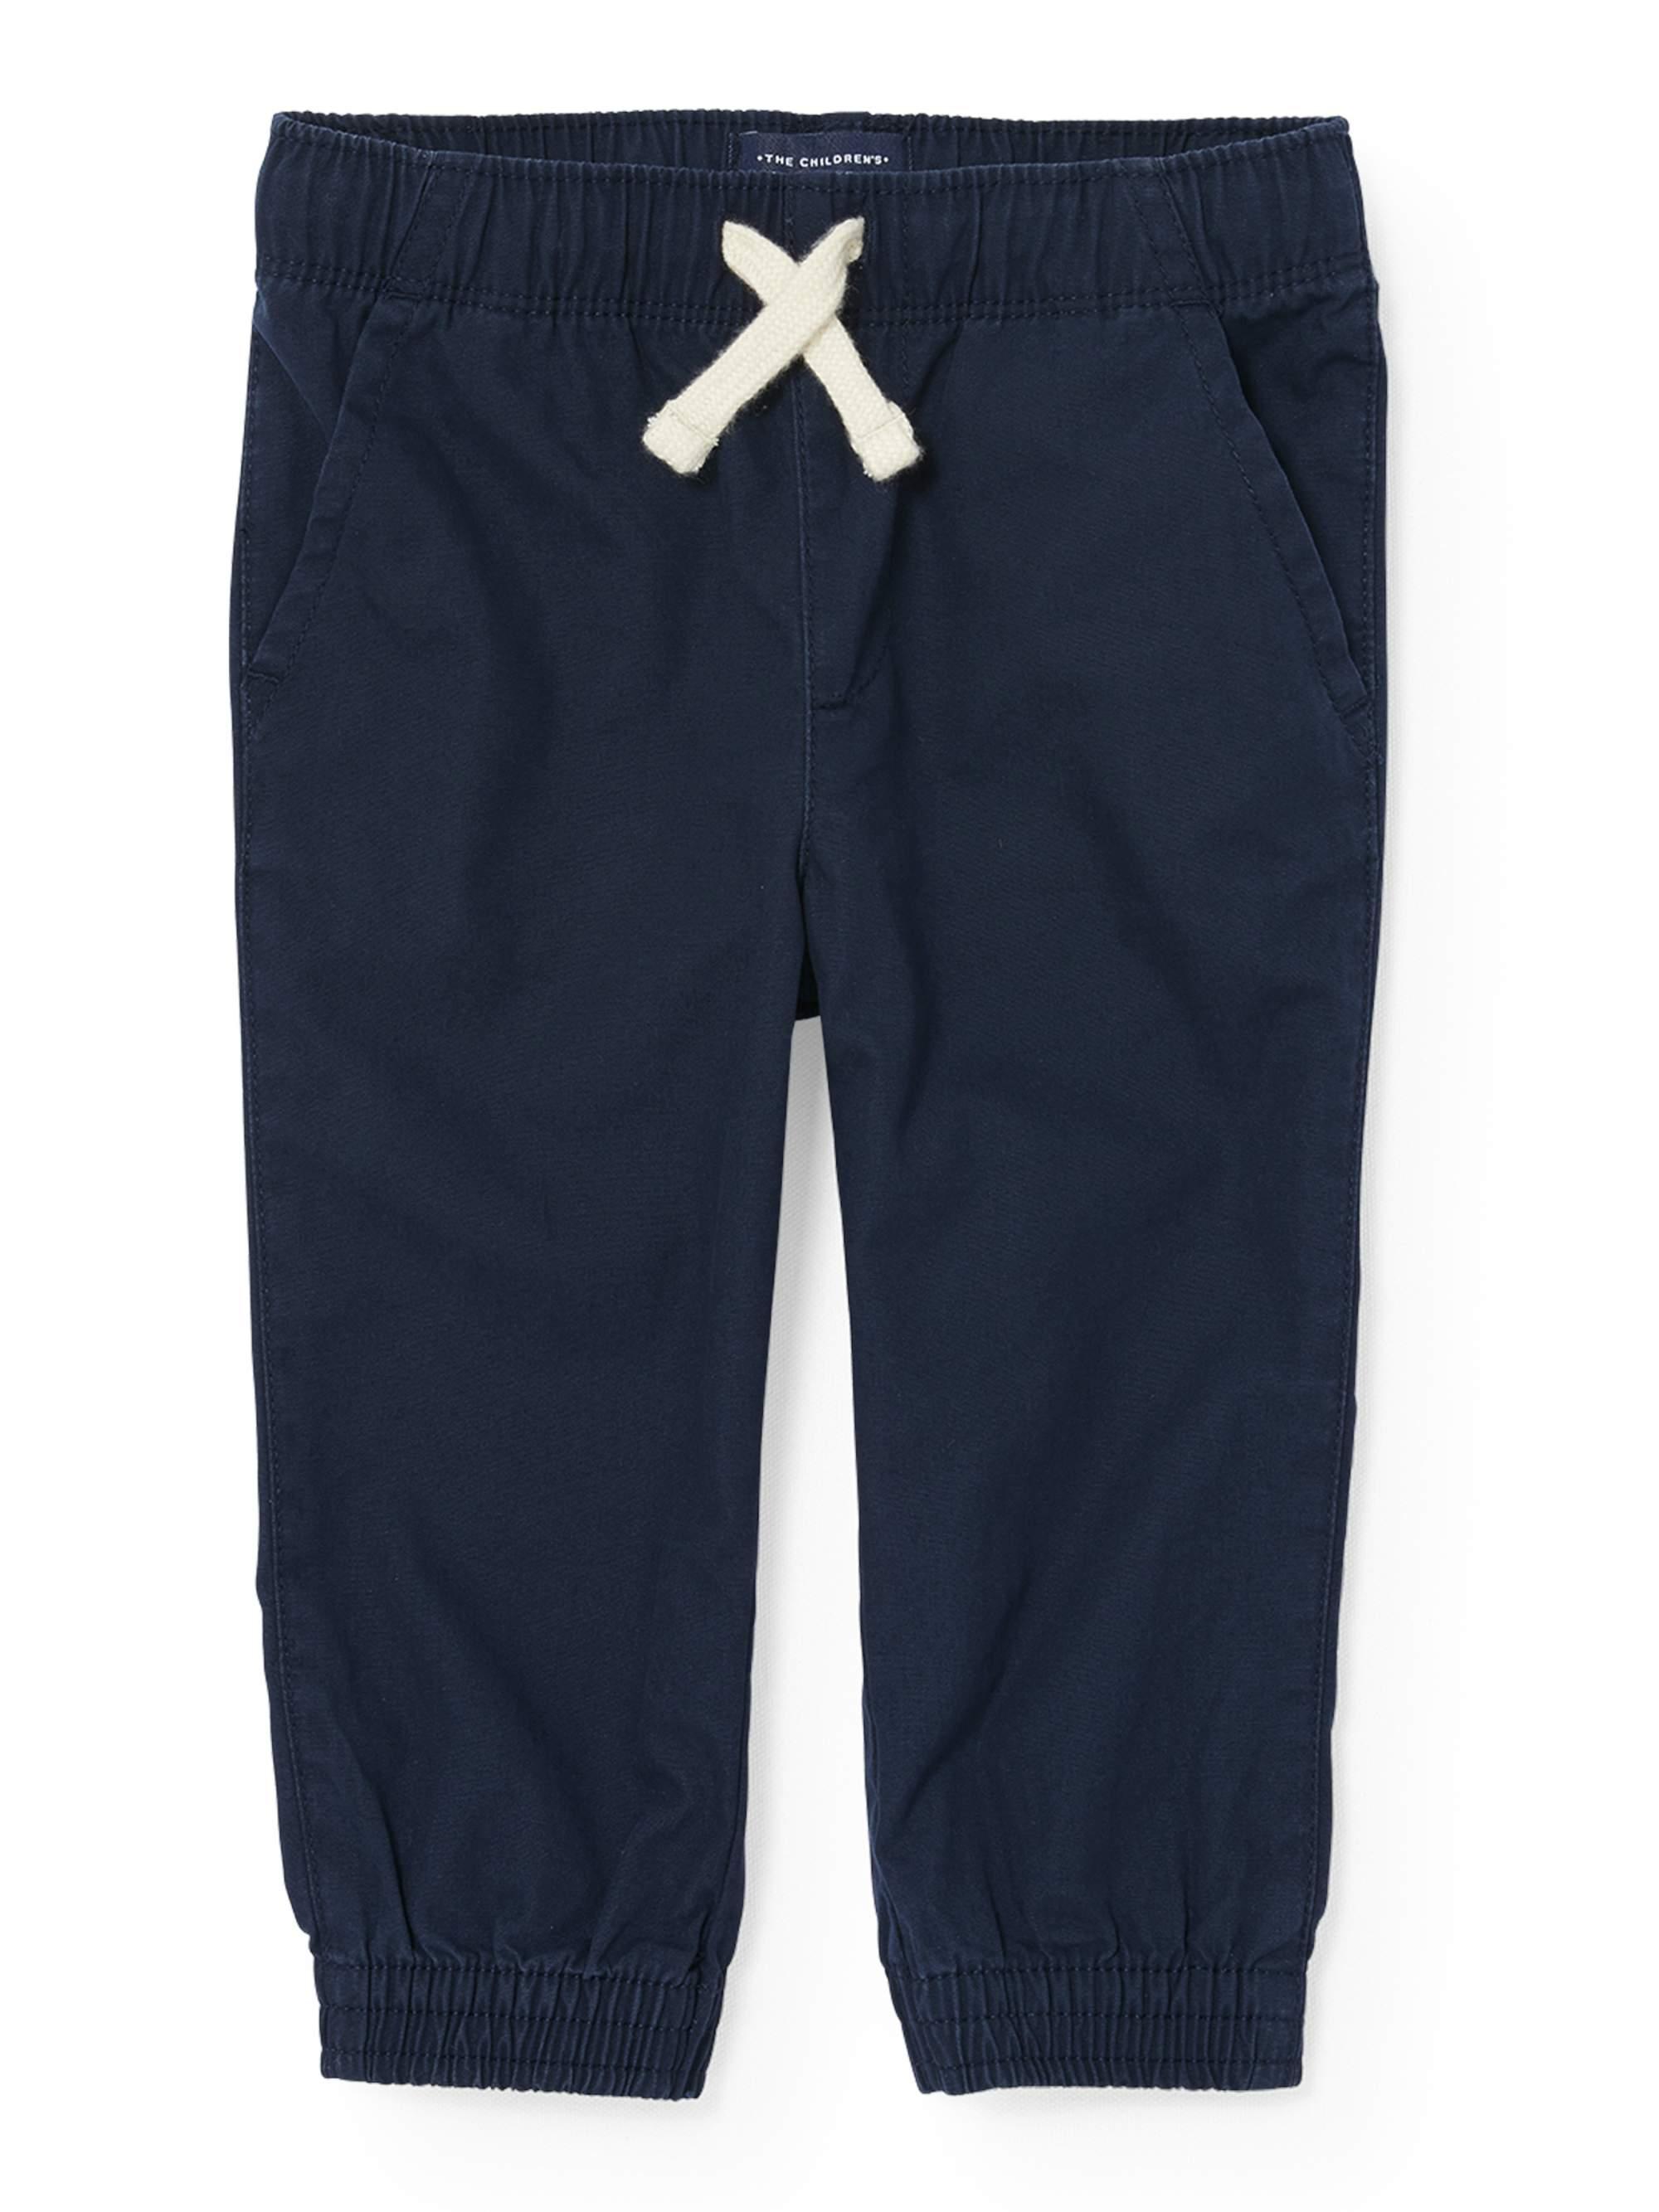 Drawstring Jogger Pants (Baby Boys & Toddler Boys)